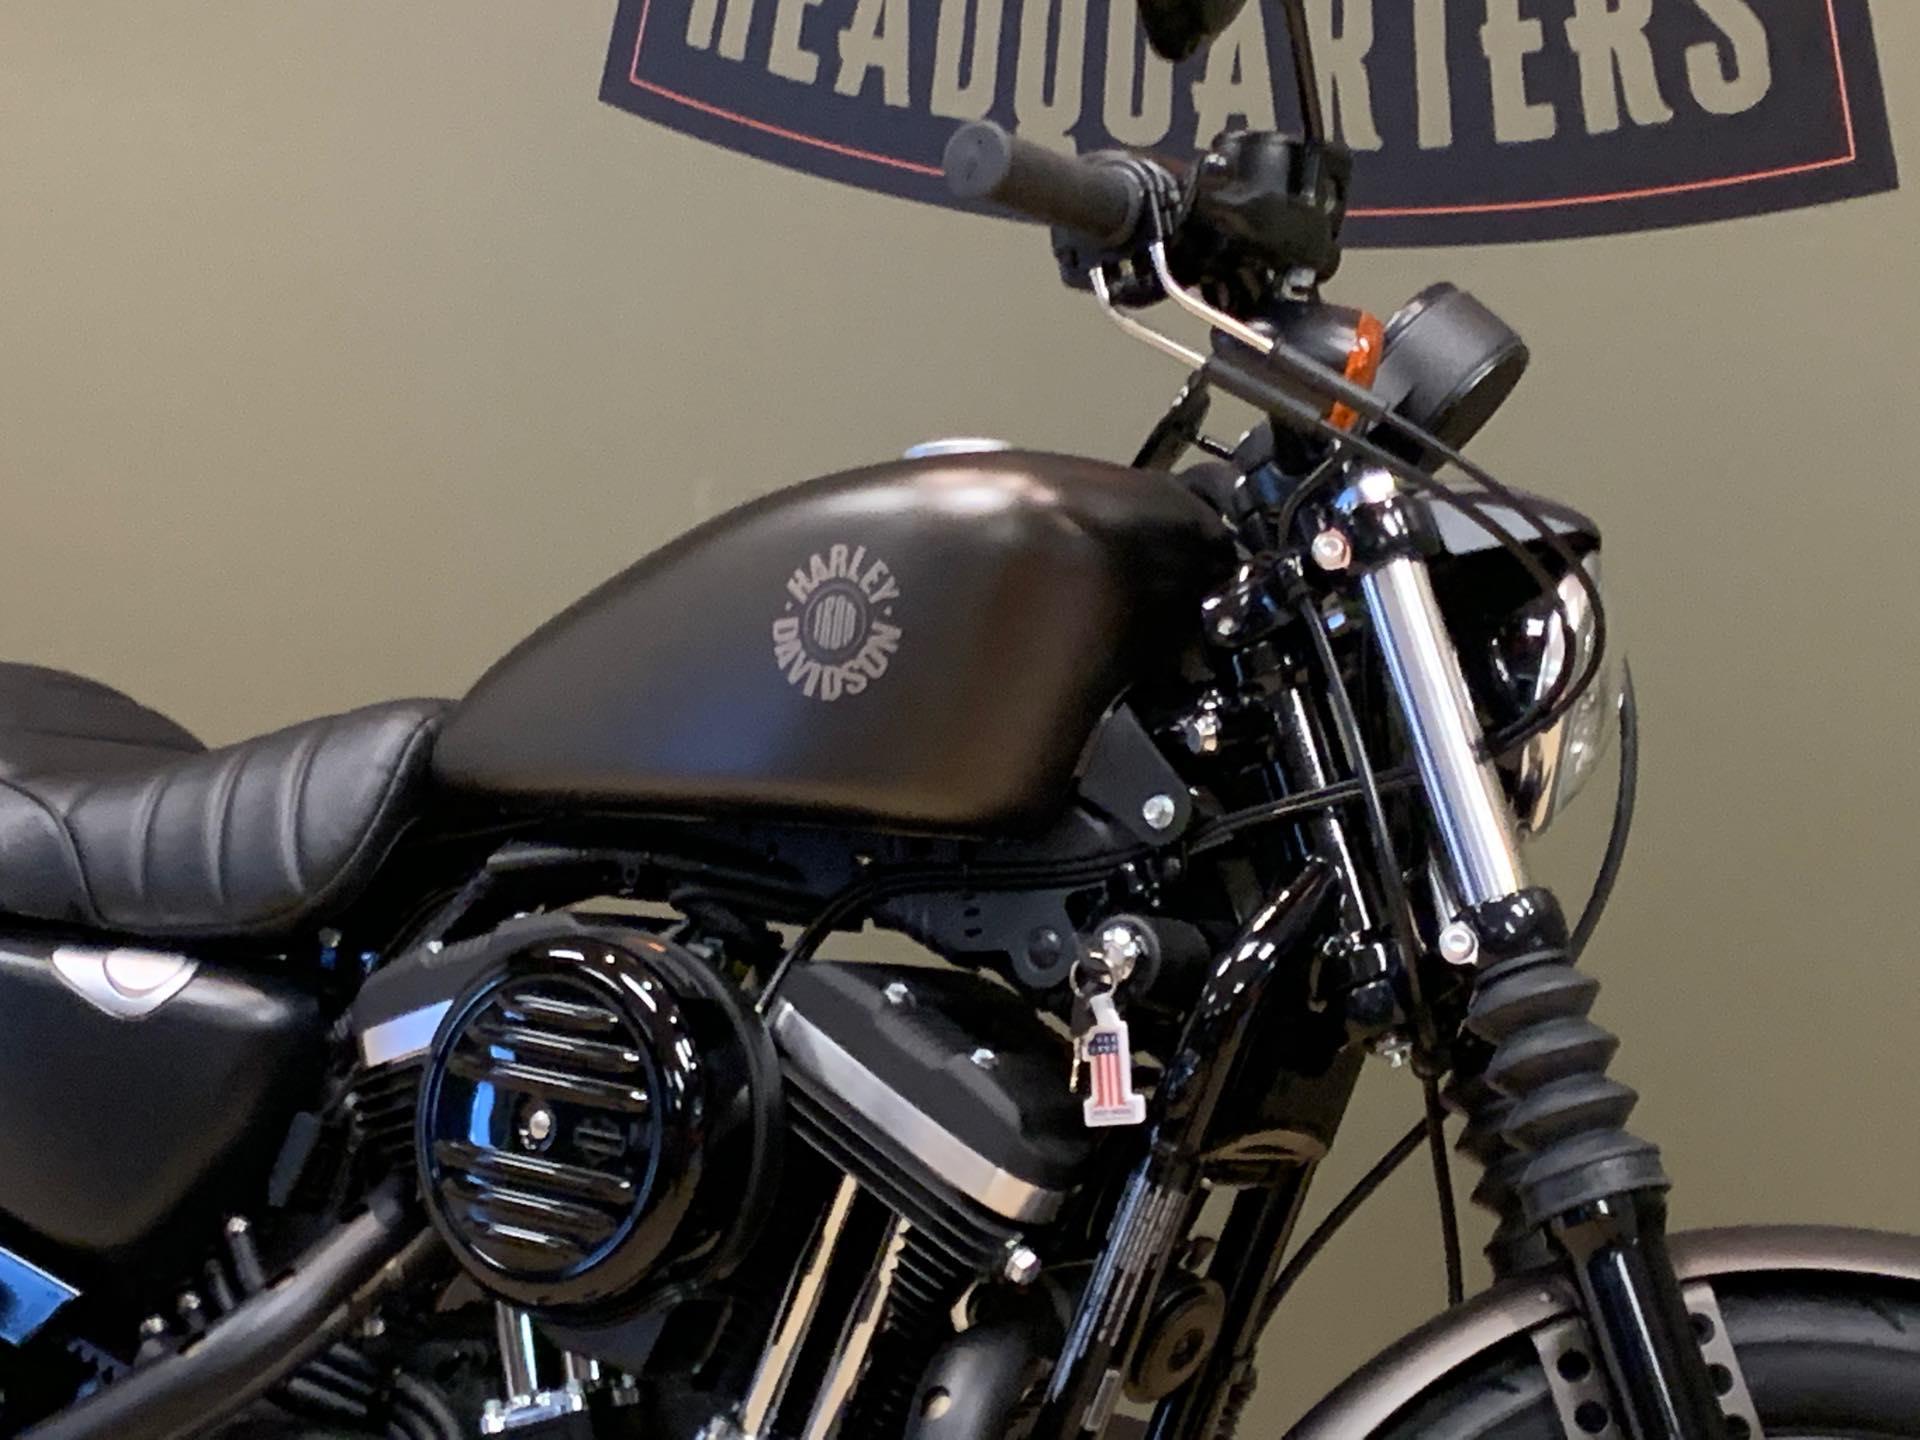 2021 HARLEY-DAVIDSON XL883N at Loess Hills Harley-Davidson